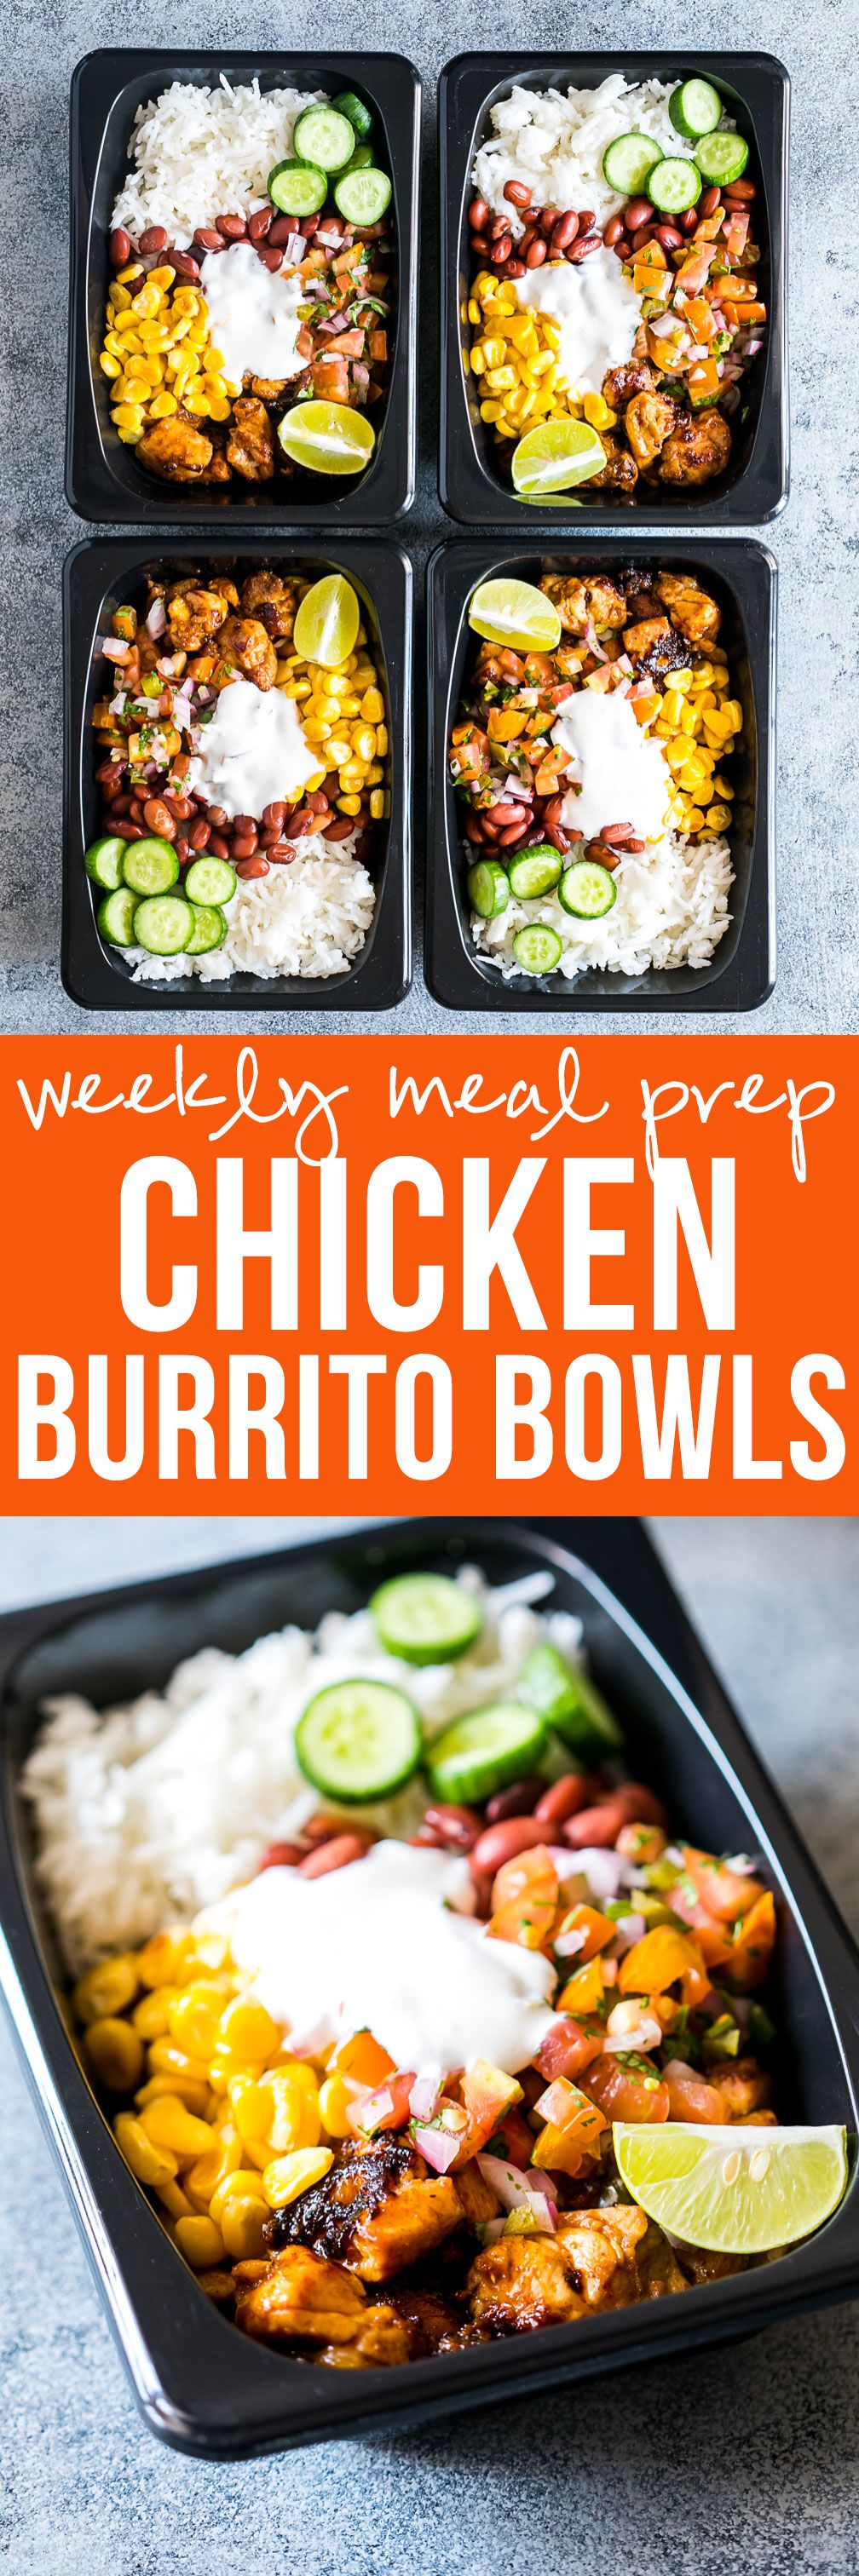 easy chicken burrito meal prep bowls | recipe | delicious recipes